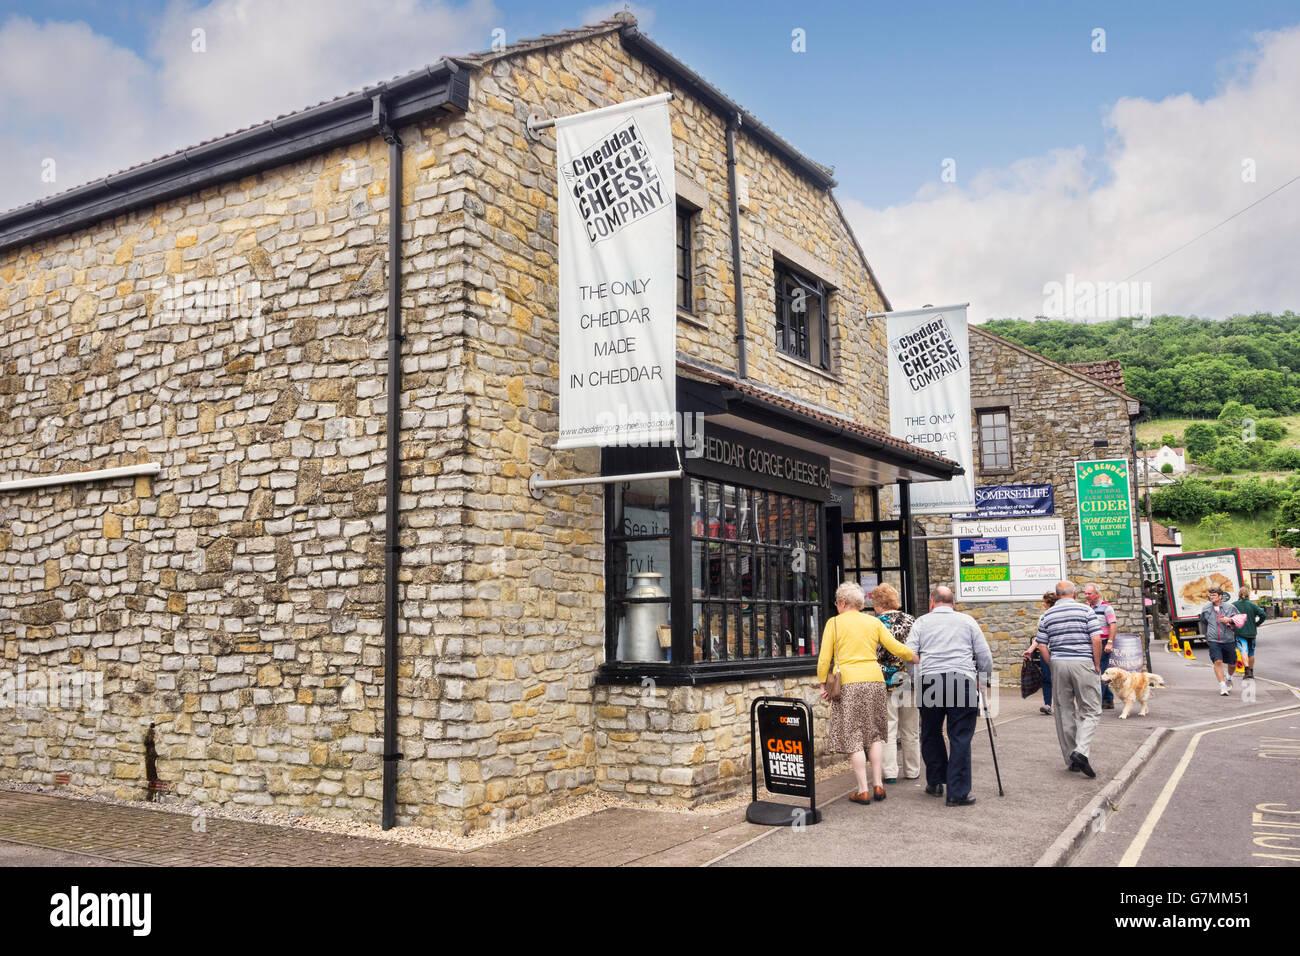 Cheddar Gorge Cheese Company, Cheddar Gorge, Somerset, Inghilterra, Regno Unito Immagini Stock